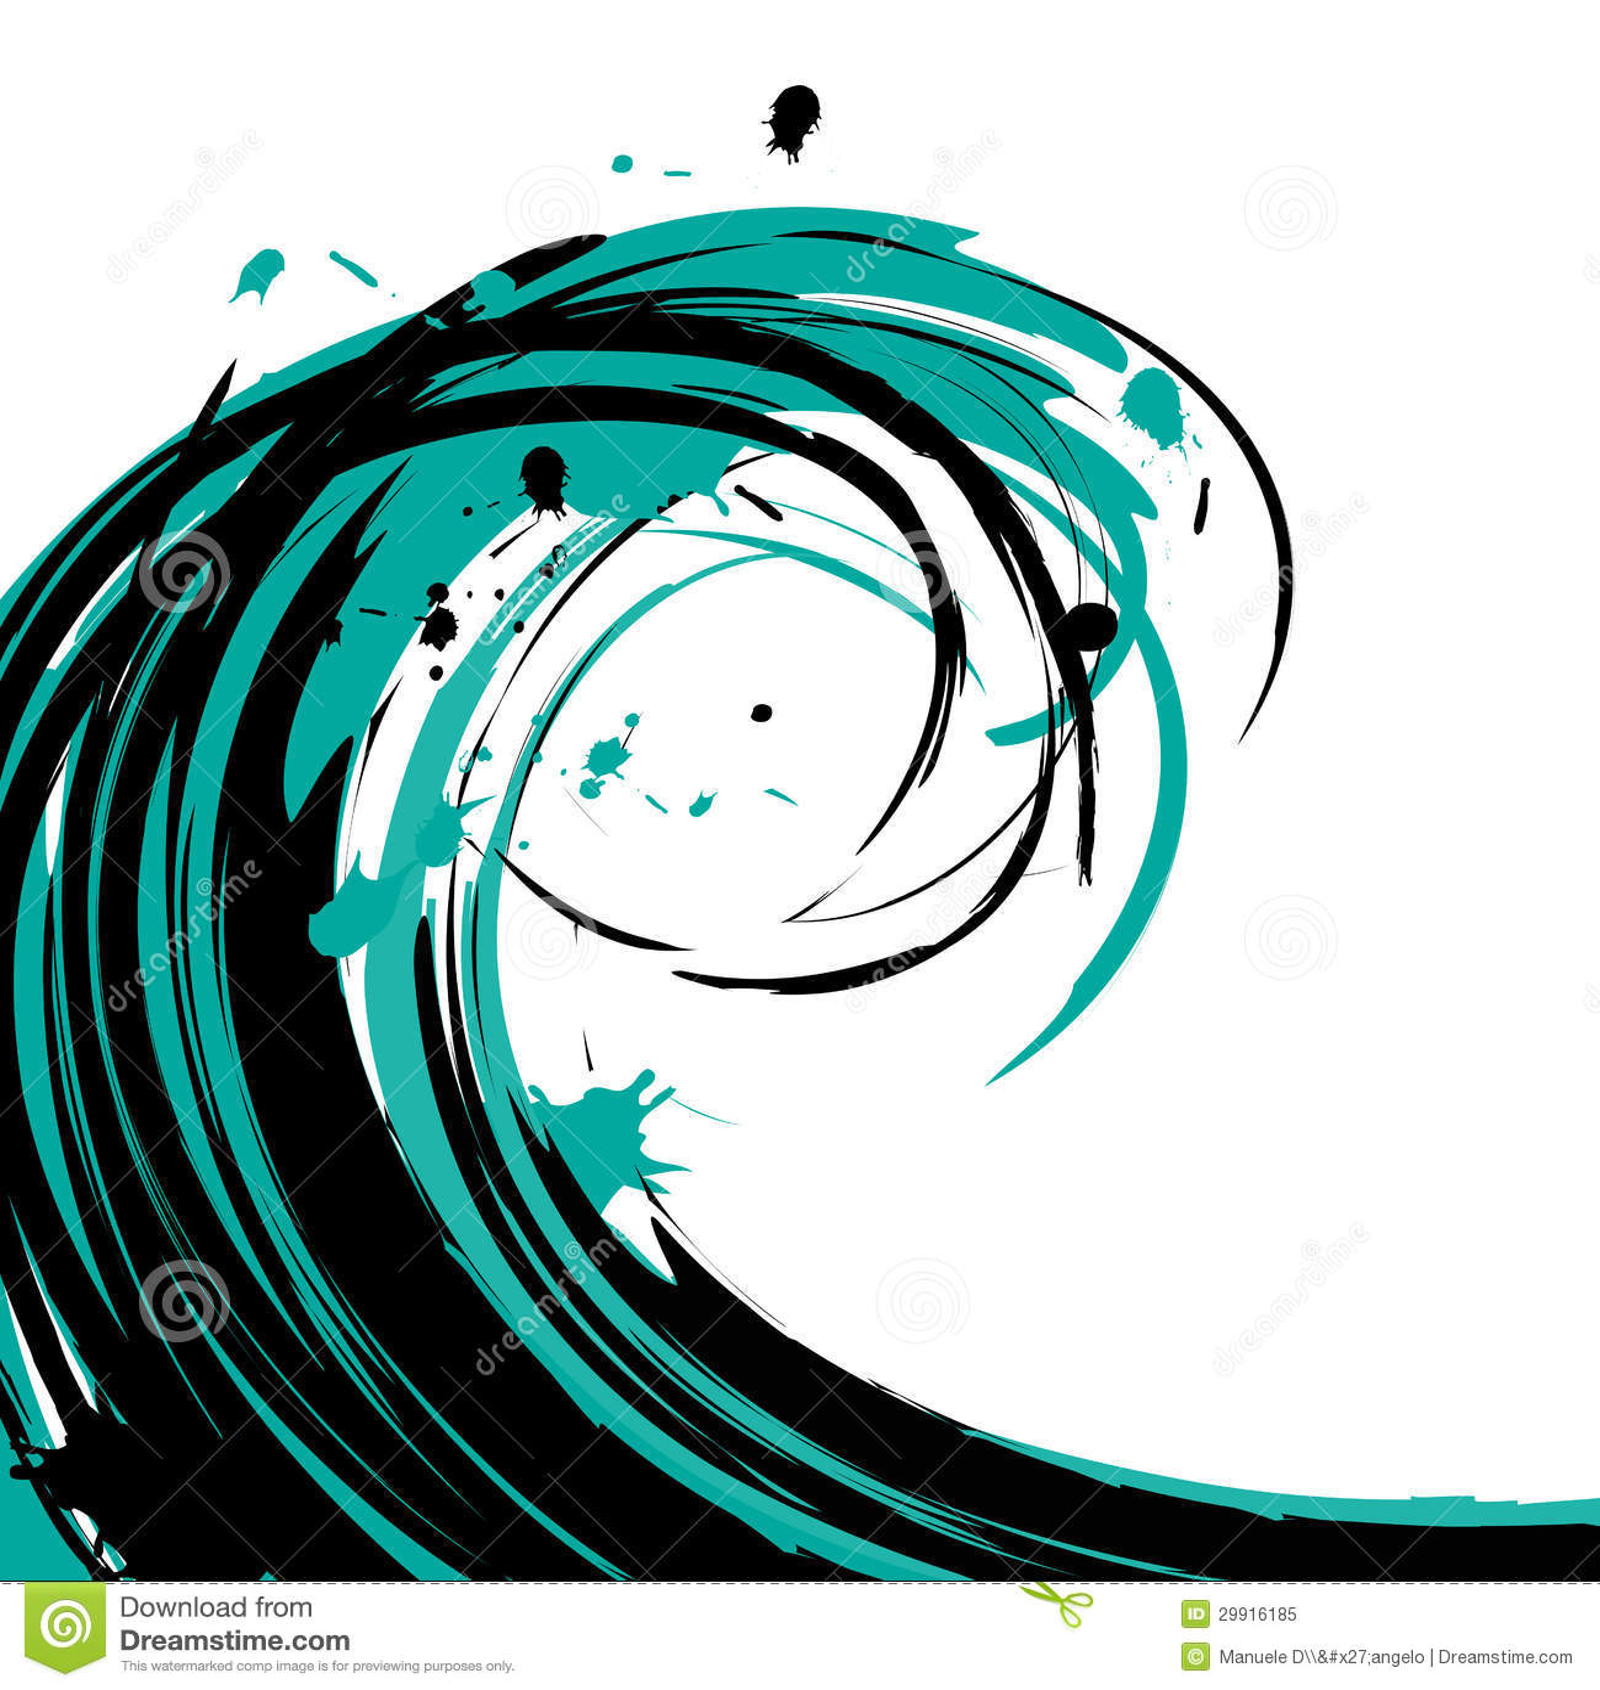 Illustration Wave Brushstroke Stock Vector